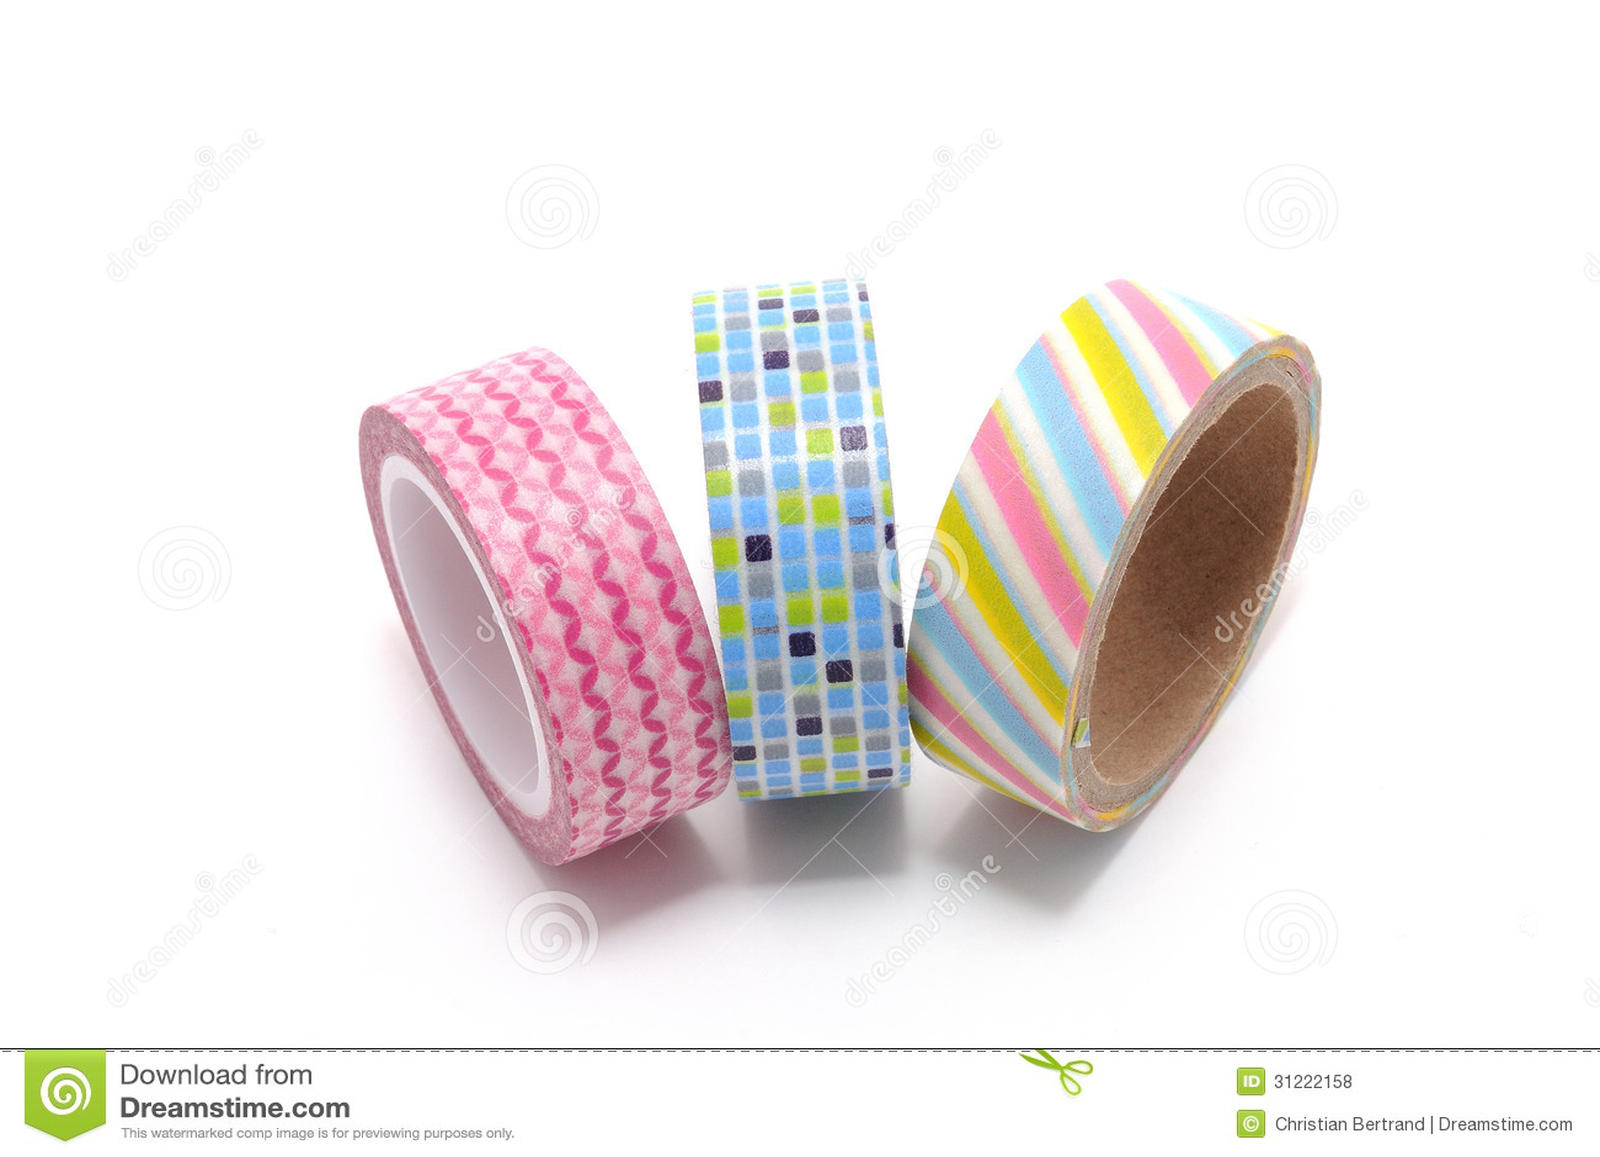 Washi tape isolated on white background stock photo for Decoration tape